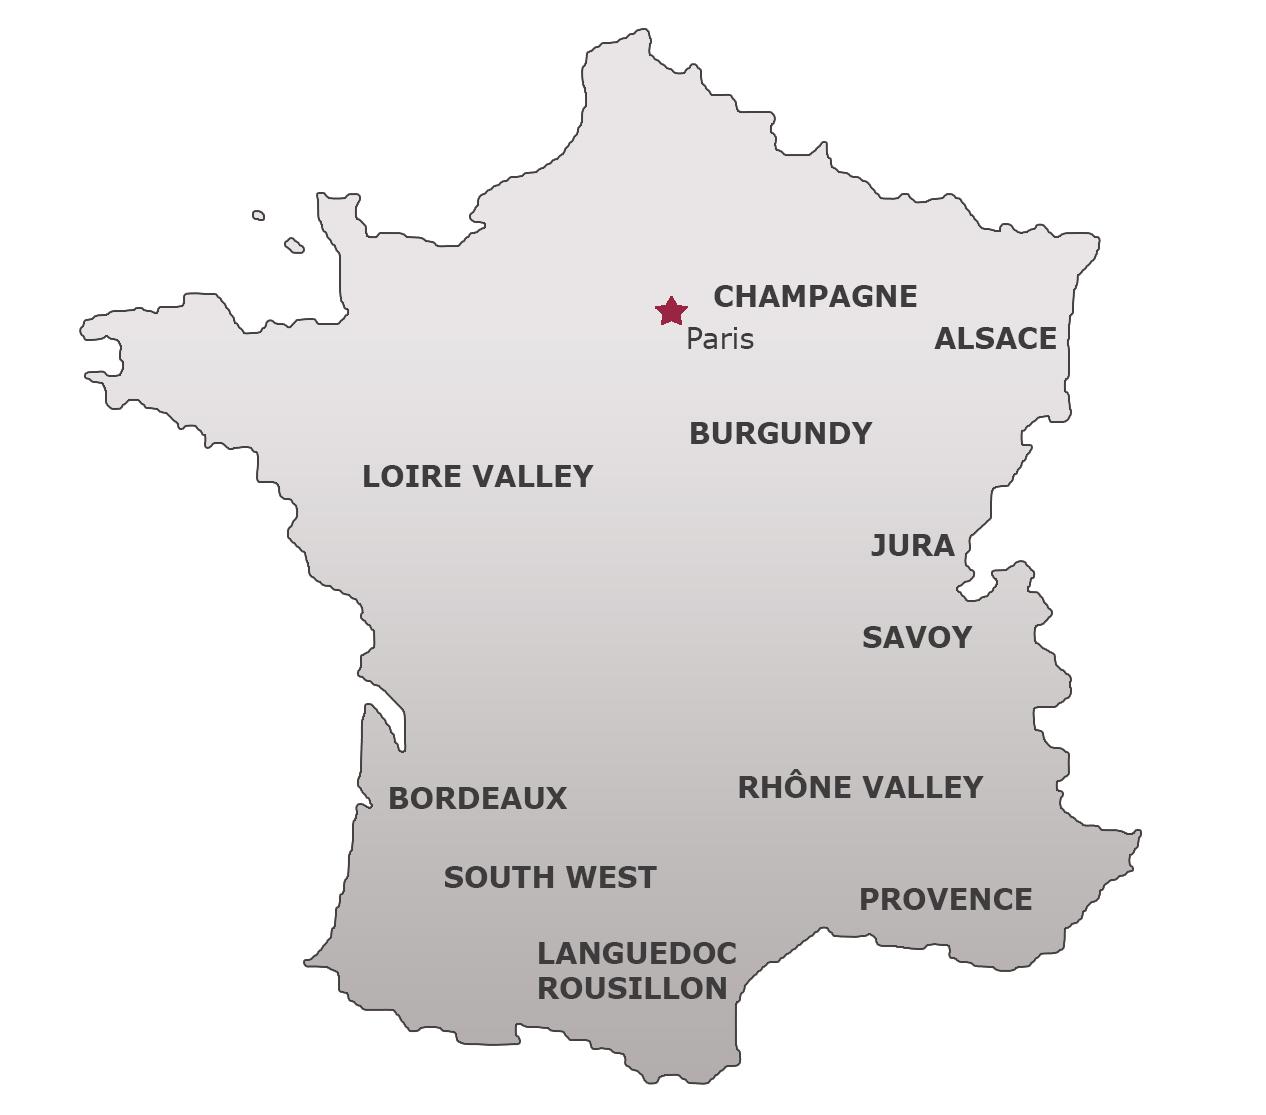 Karta Champagnedistriktet Frankrike.Champagne Omradet Frankrike Chancegeneral Live